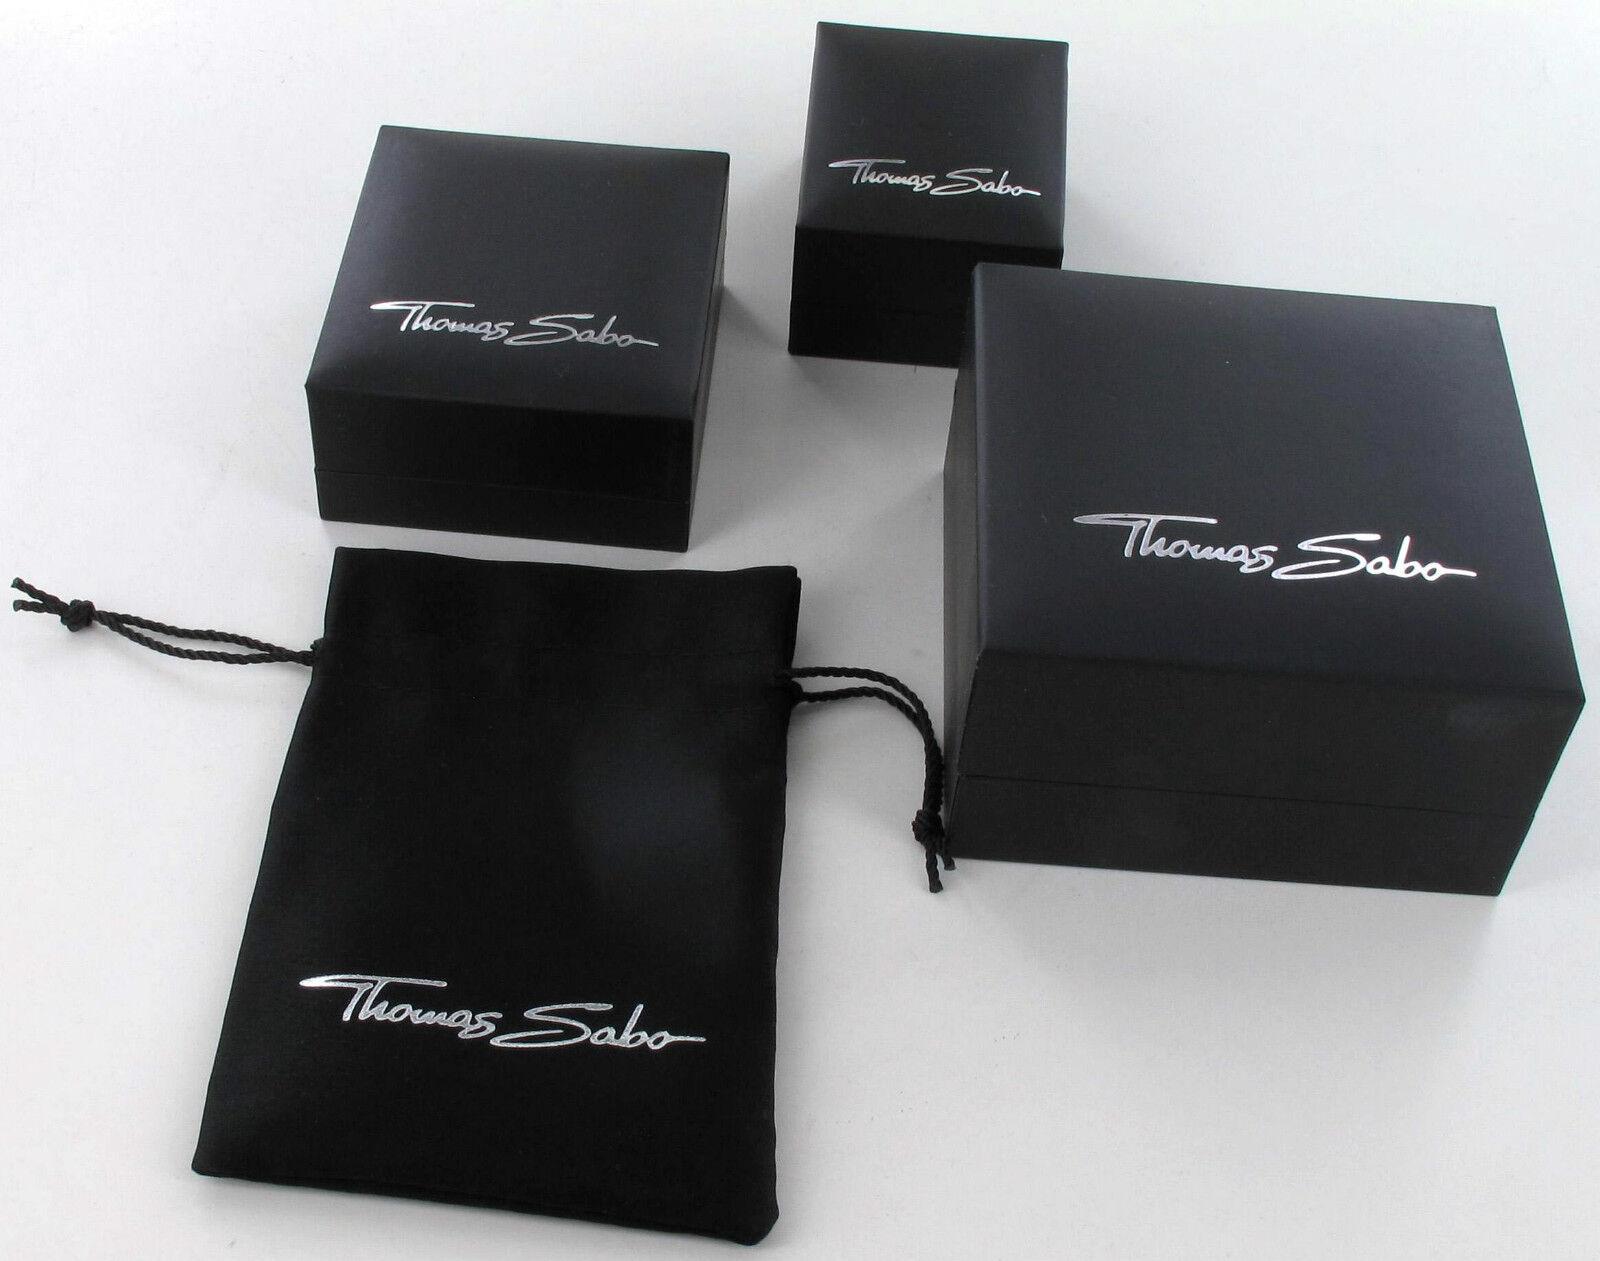 Thomas Sabo Bracciale Bead Bead Bead kt0003 con 5 beads 925 - Sterling argentoo prezzo consigliato 25c174